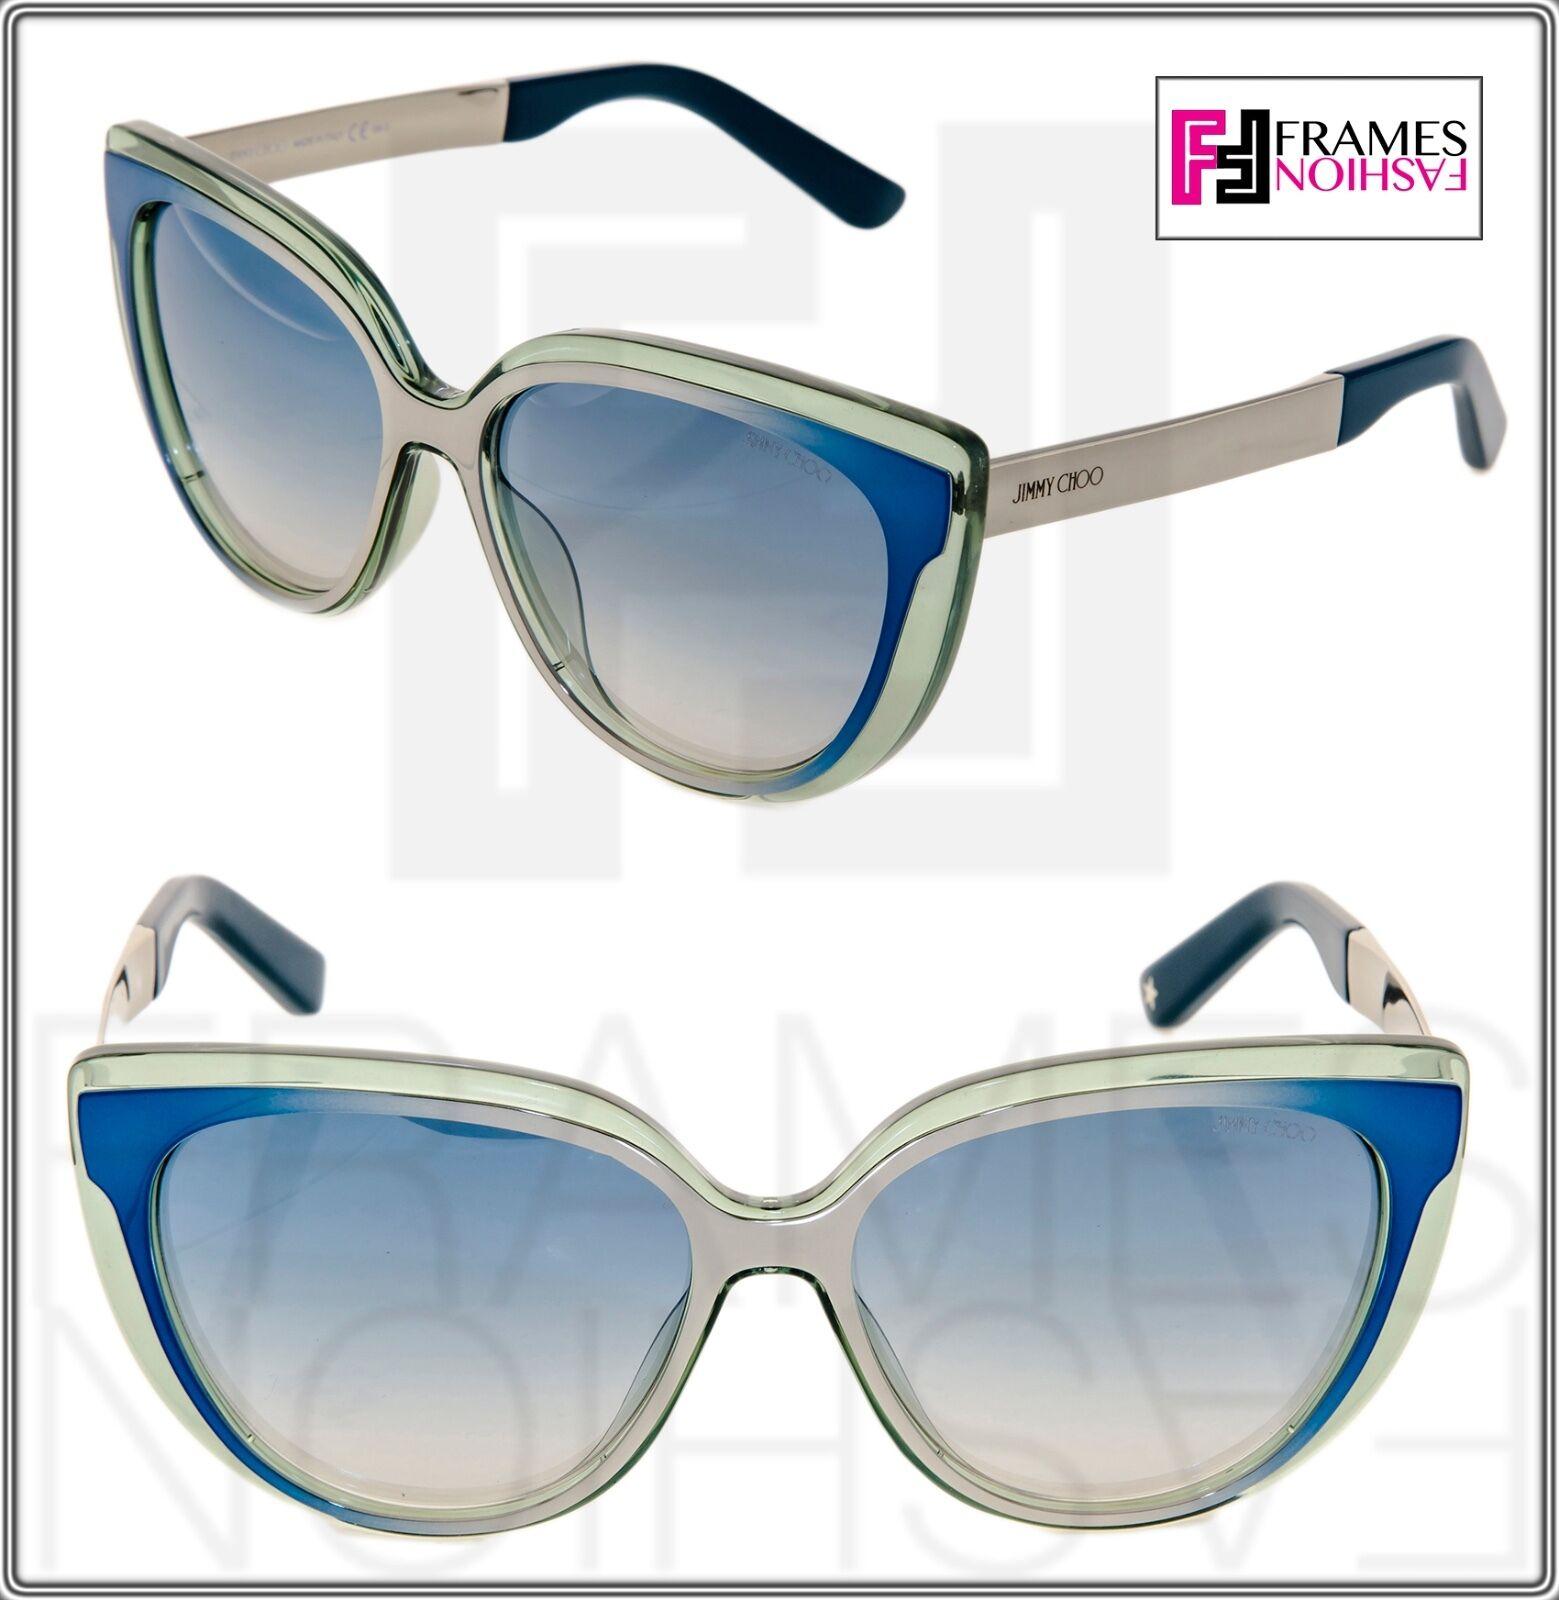 9ac0e48f8f Buy Jimmy Choo Sunglasses Cindy s 1q356 Azure Blue Mirror Authentic ...